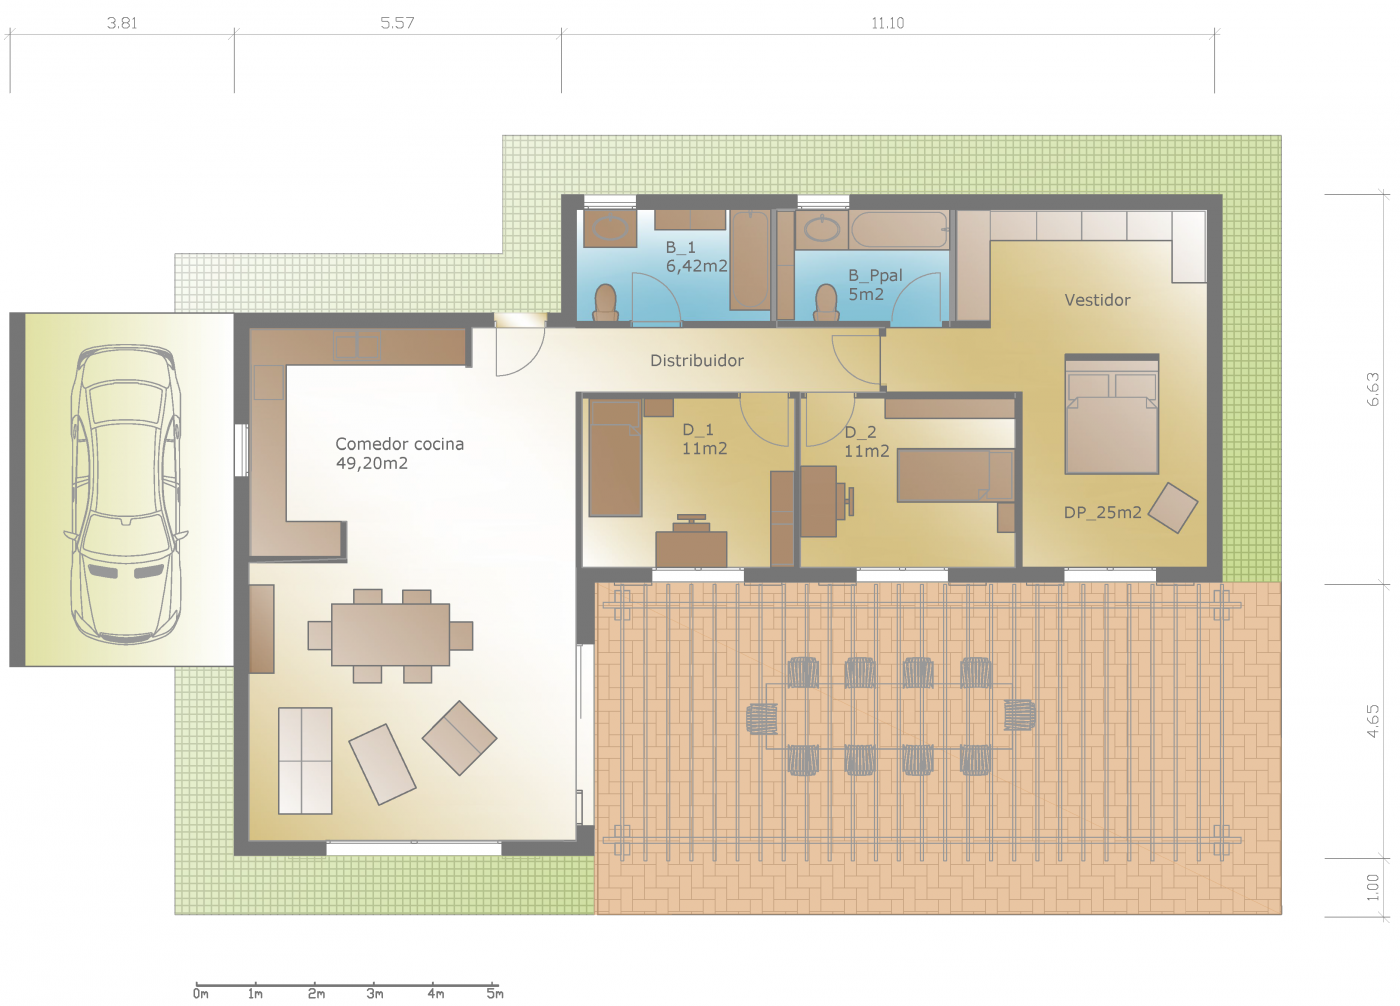 Plano de planta dise o casa rustica moderna - Diseno casas rusticas ...